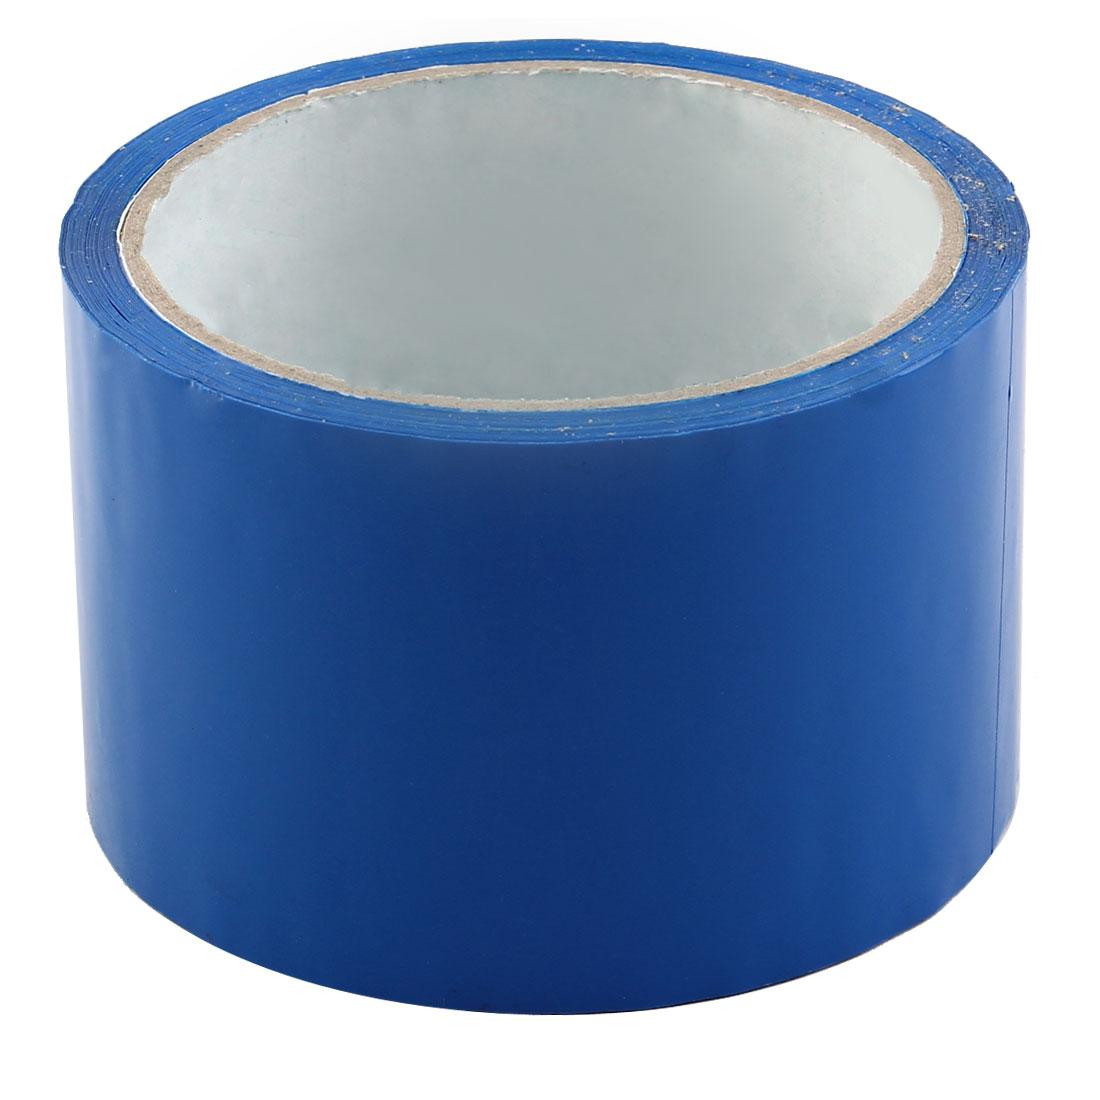 Shipping PVC Box Sealing Adhesive Tape Dark Blue 2.4'' x 32.8 Yards(98.4 Ft)